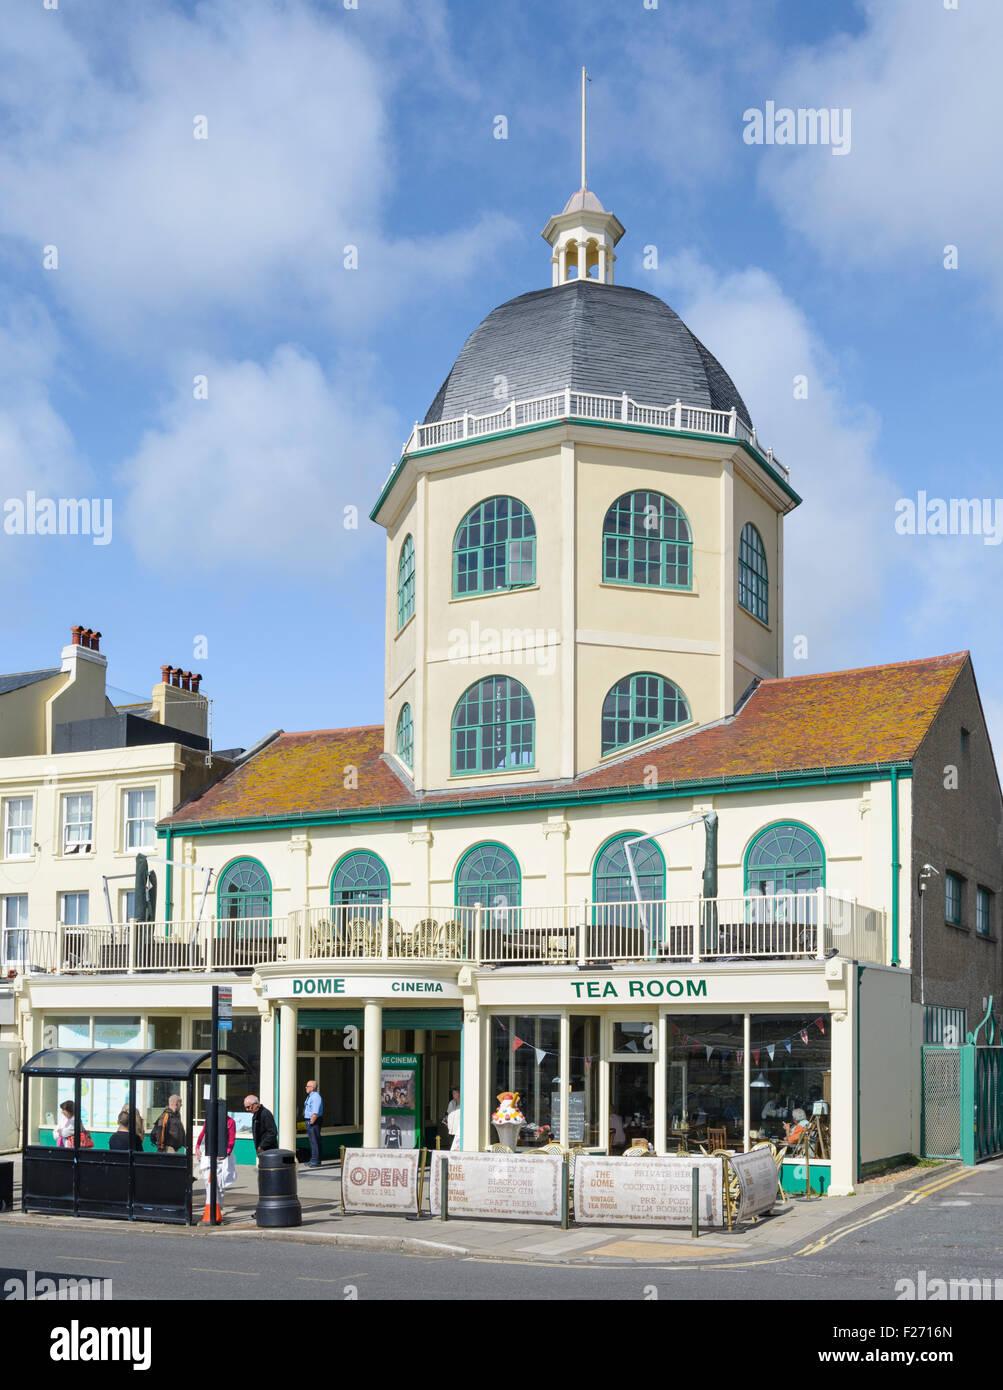 Kuppelkino Grade aufgeführten II Gebäude in Worthing, West Sussex, England, UK. Stockbild